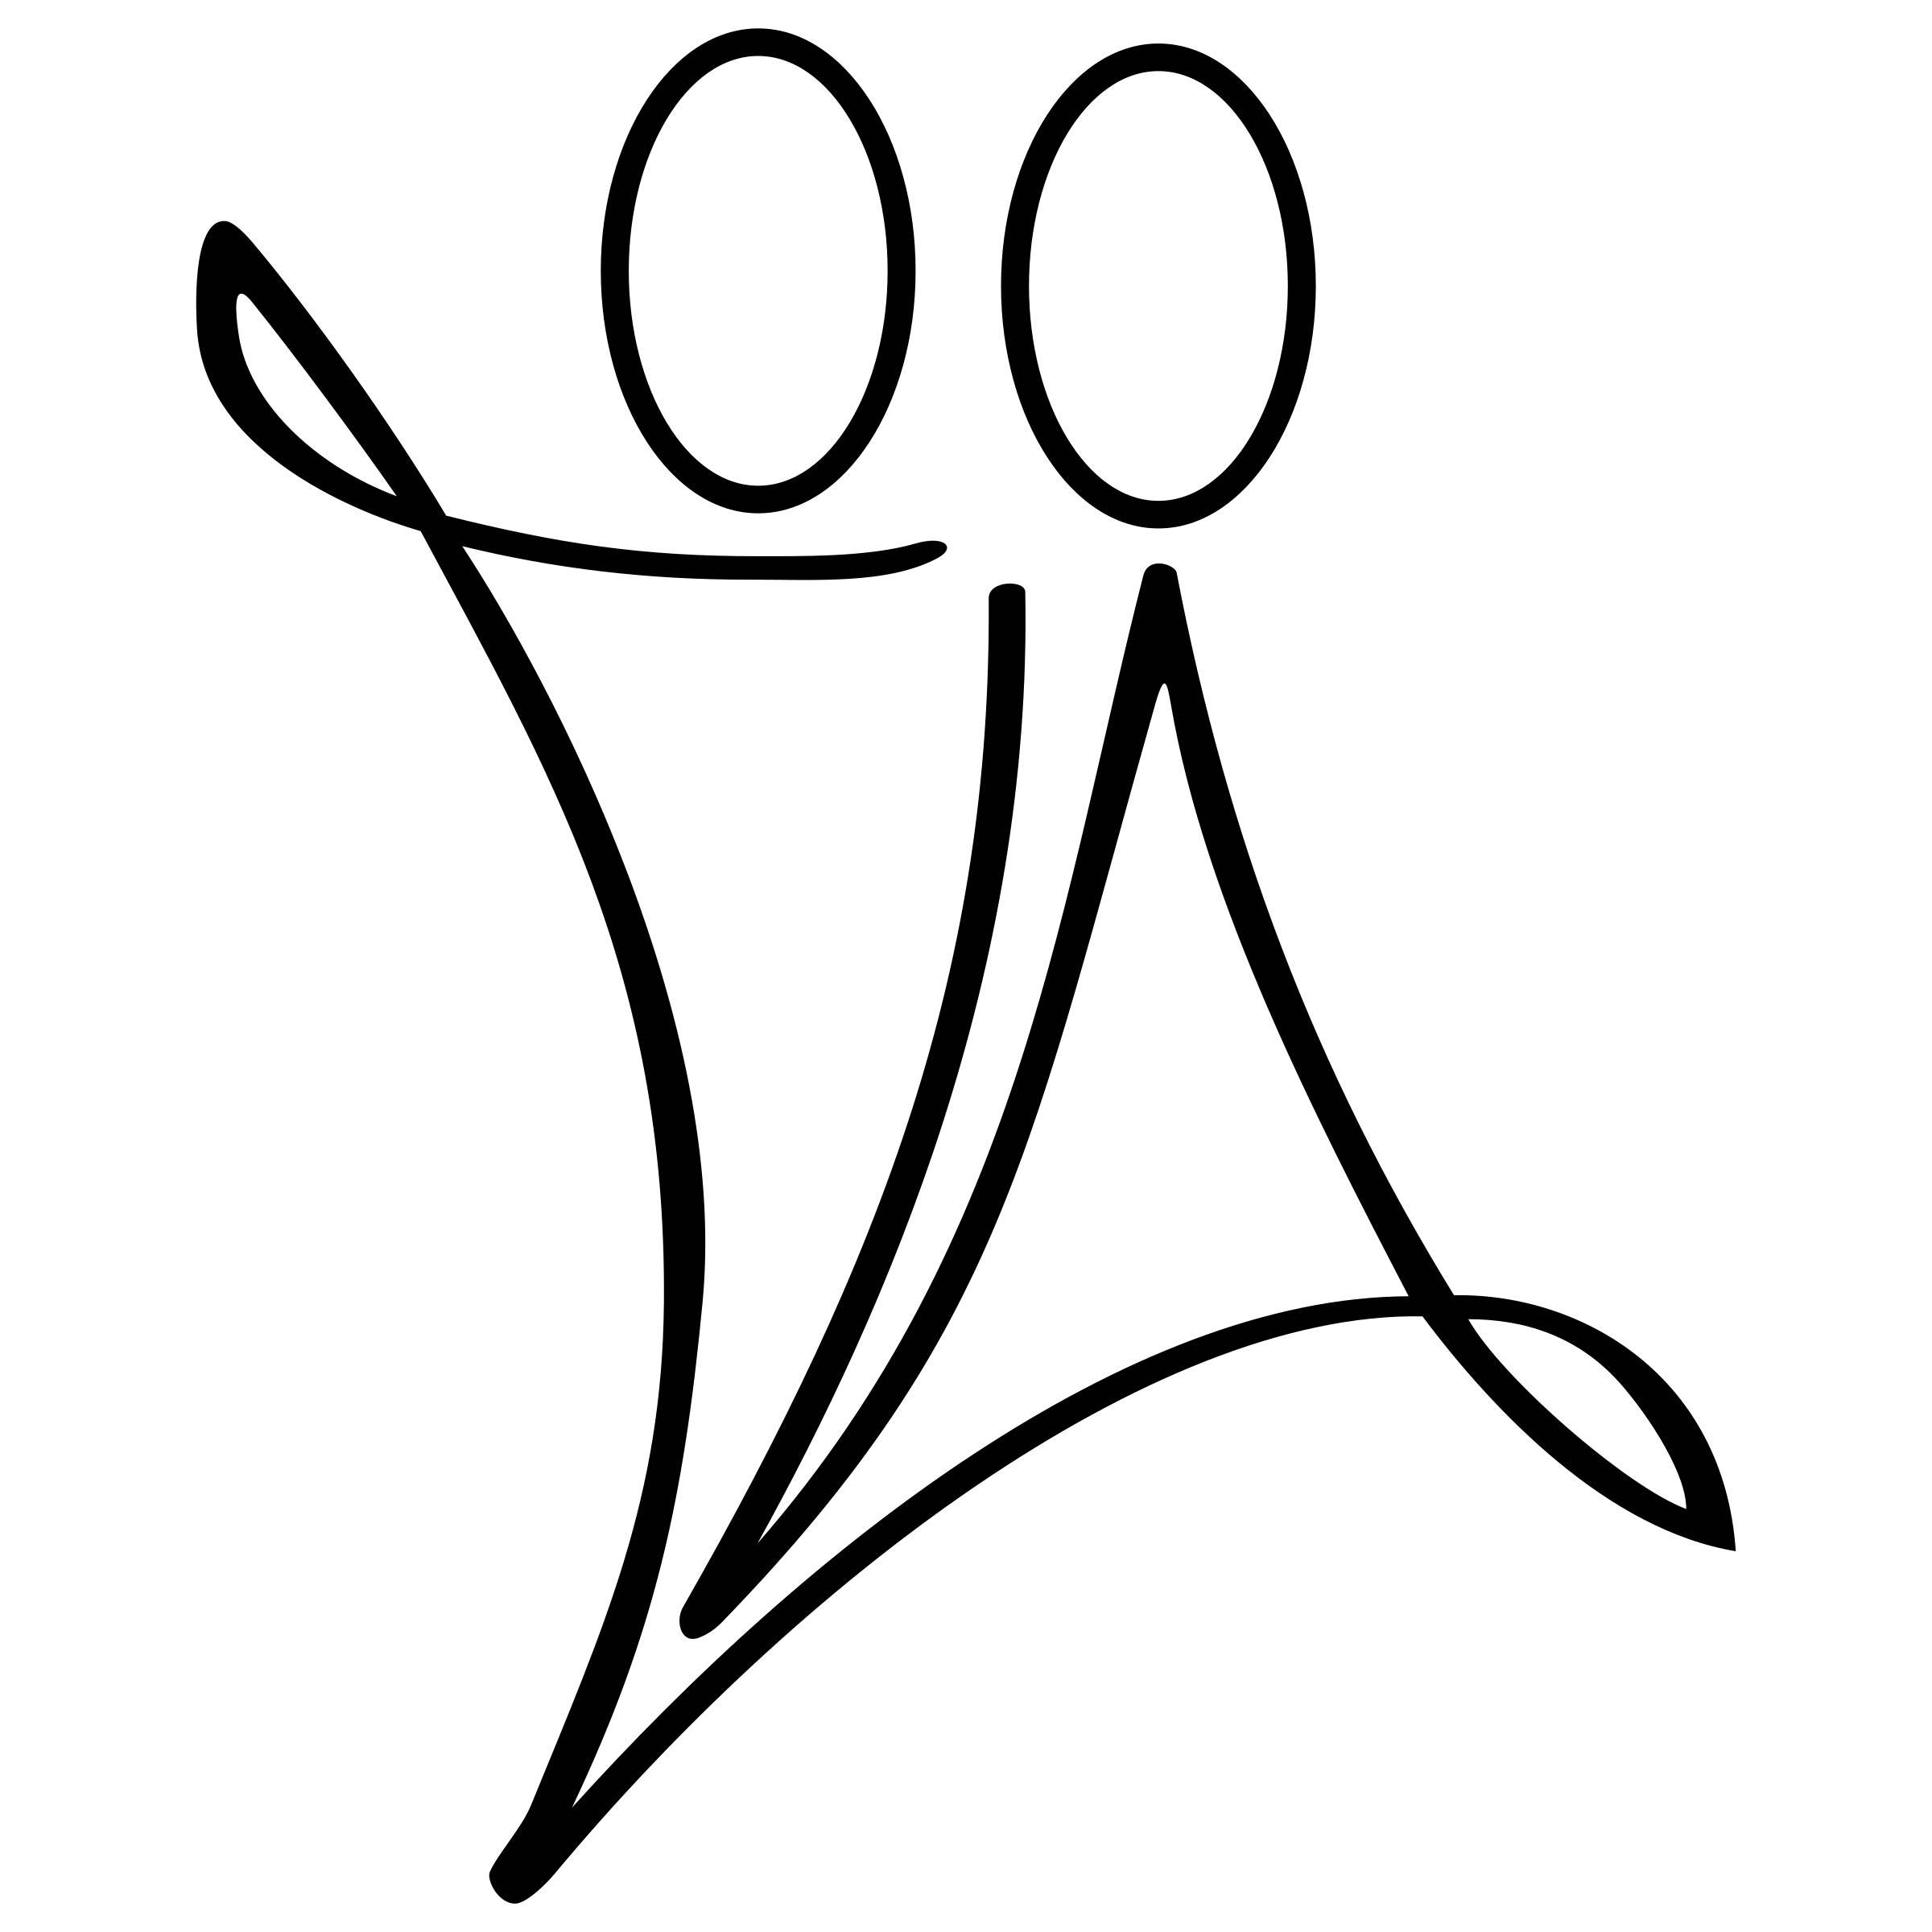 Sway Logo PNG Transparent & SVG Vector.